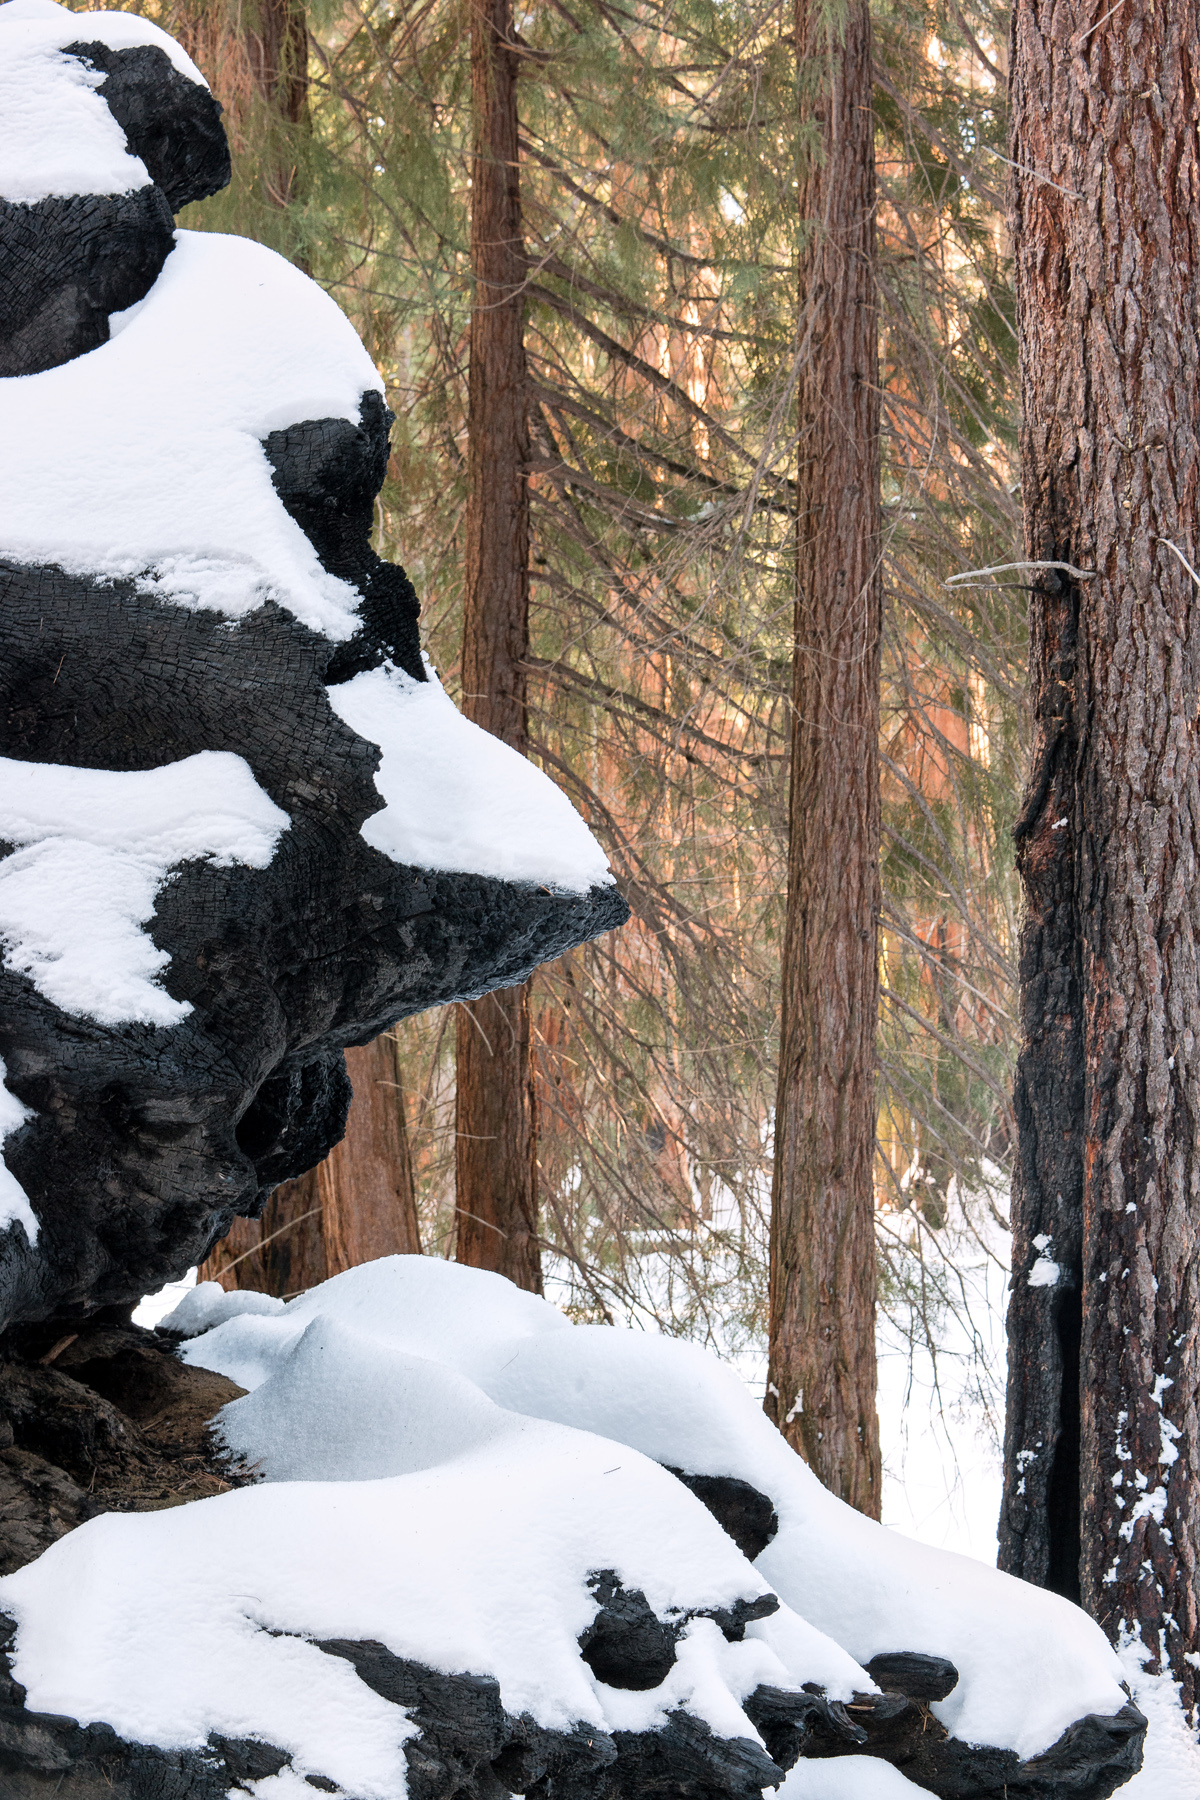 Wasim Muklashy Photography_Sequoia National Park_California_December 2015_-SAM_4052-Edit.jpg